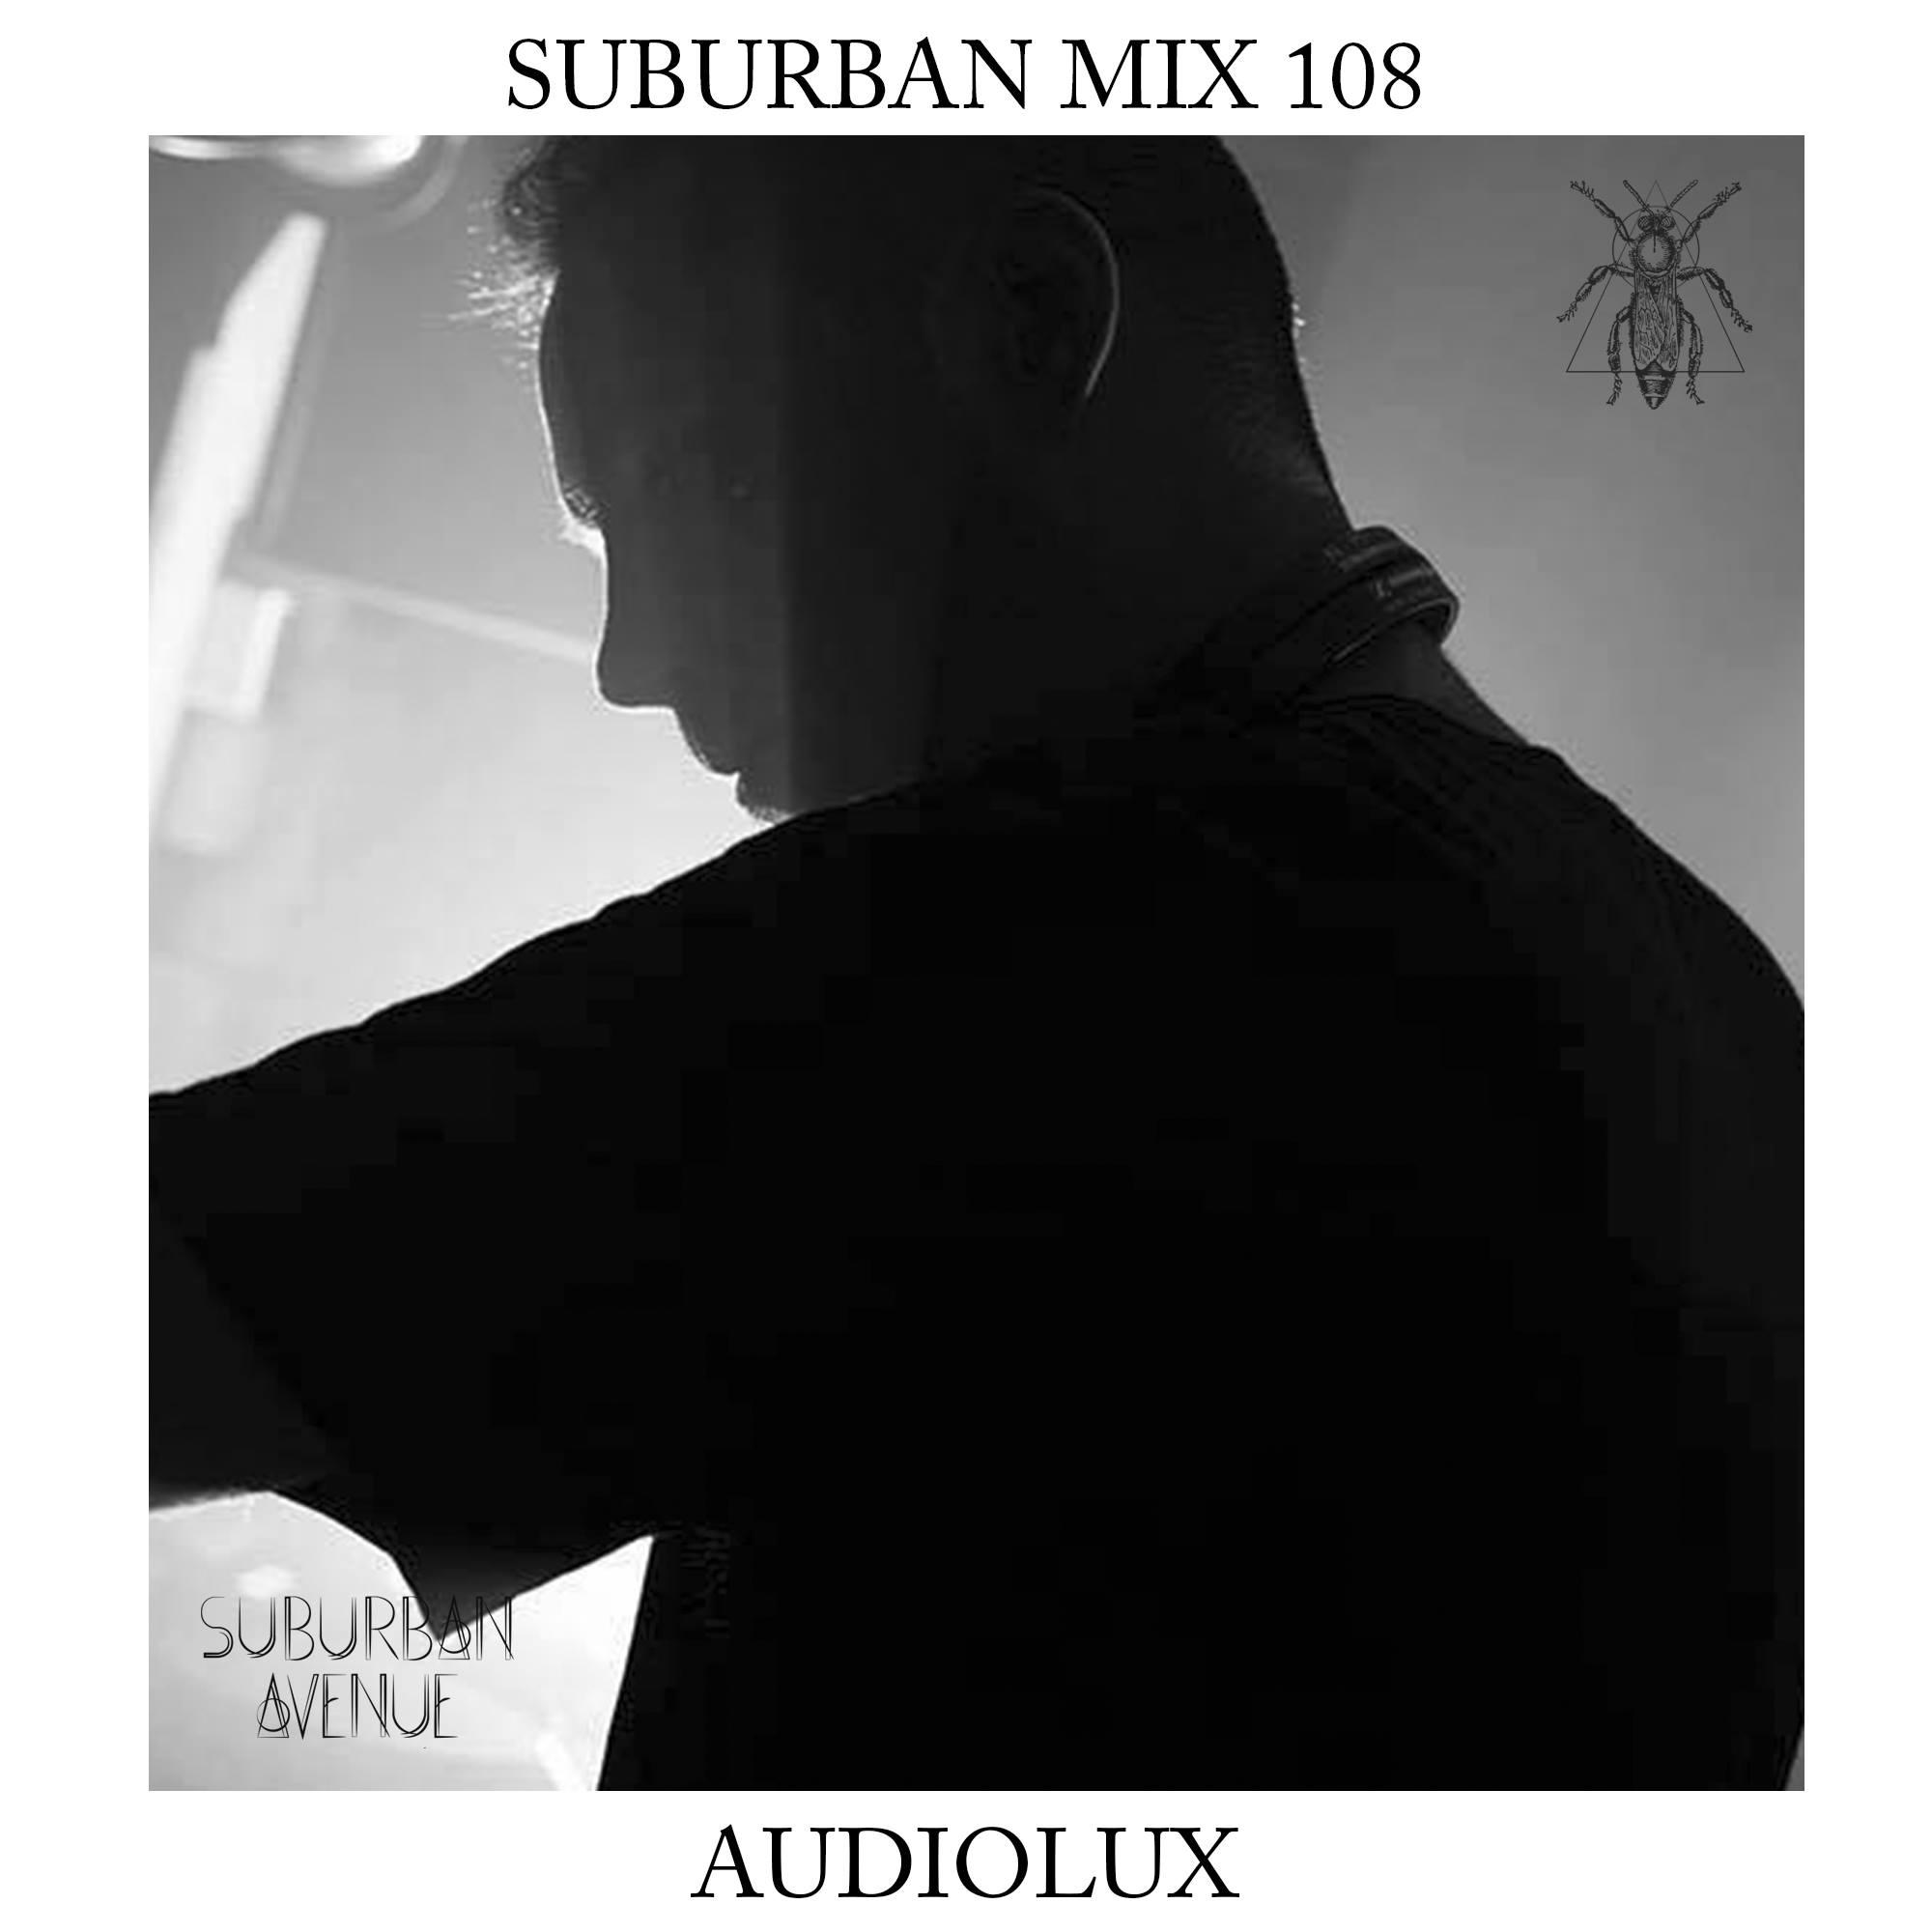 Suburban Mix 108 - Audiolux